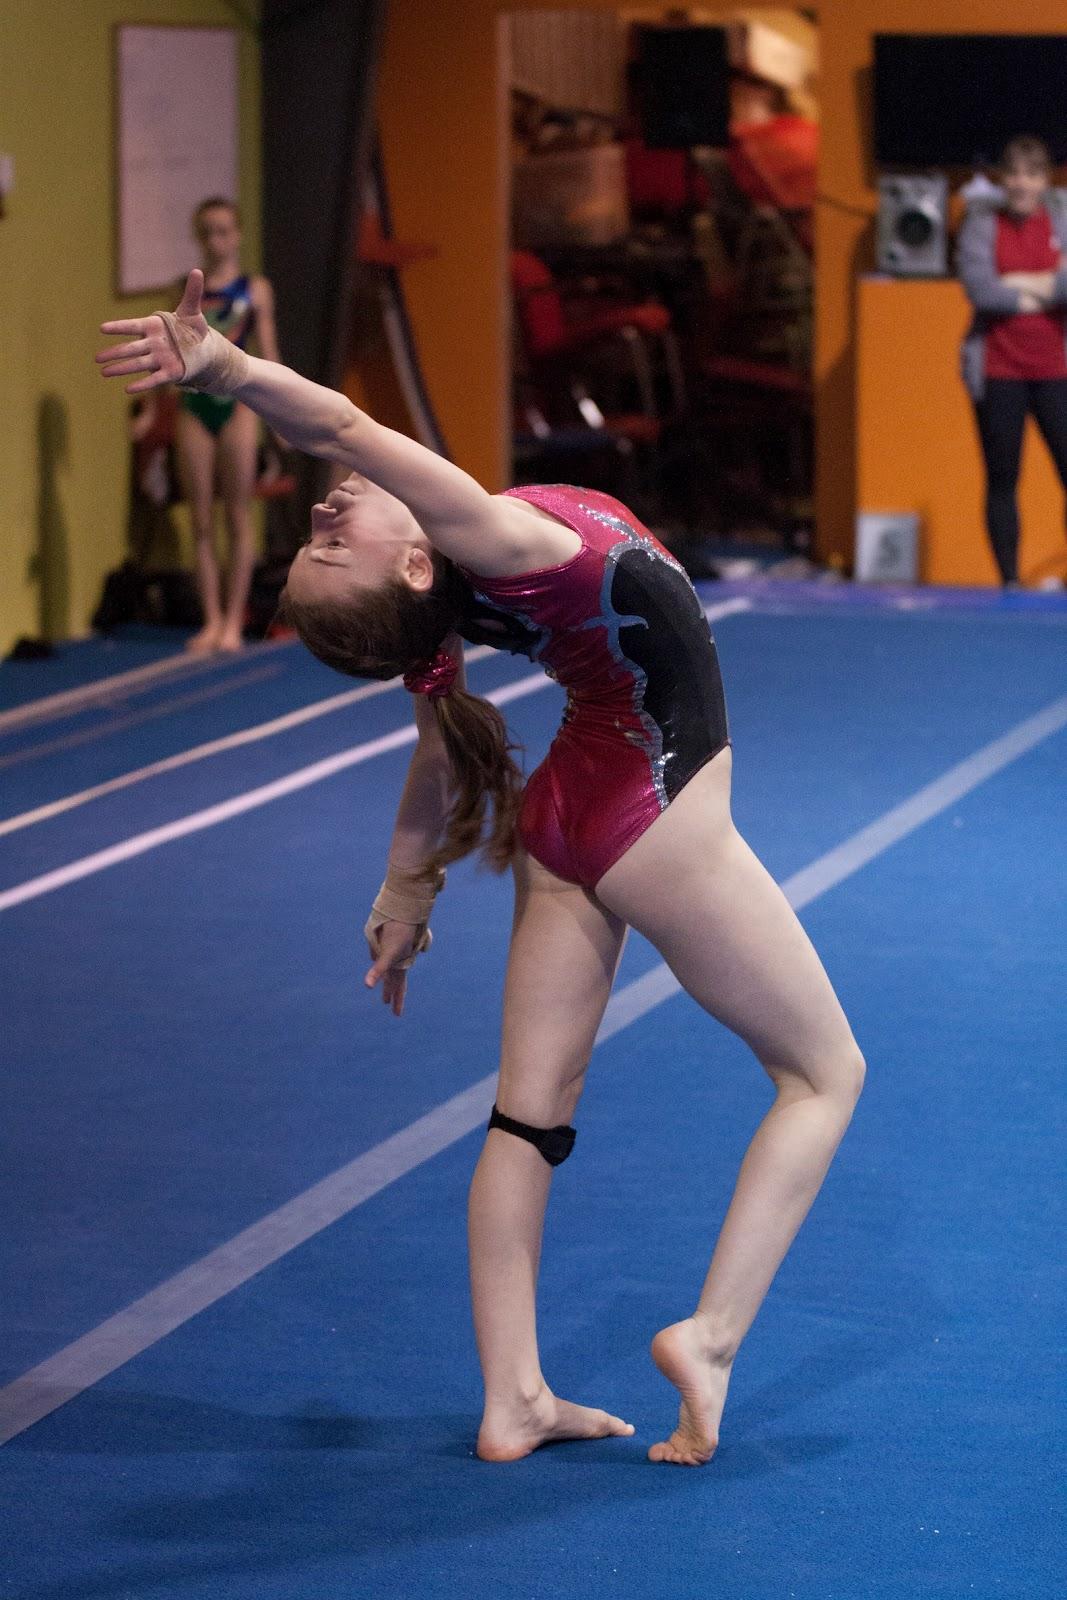 Parenting Cubed Provincial Gymnastics Competition 2012